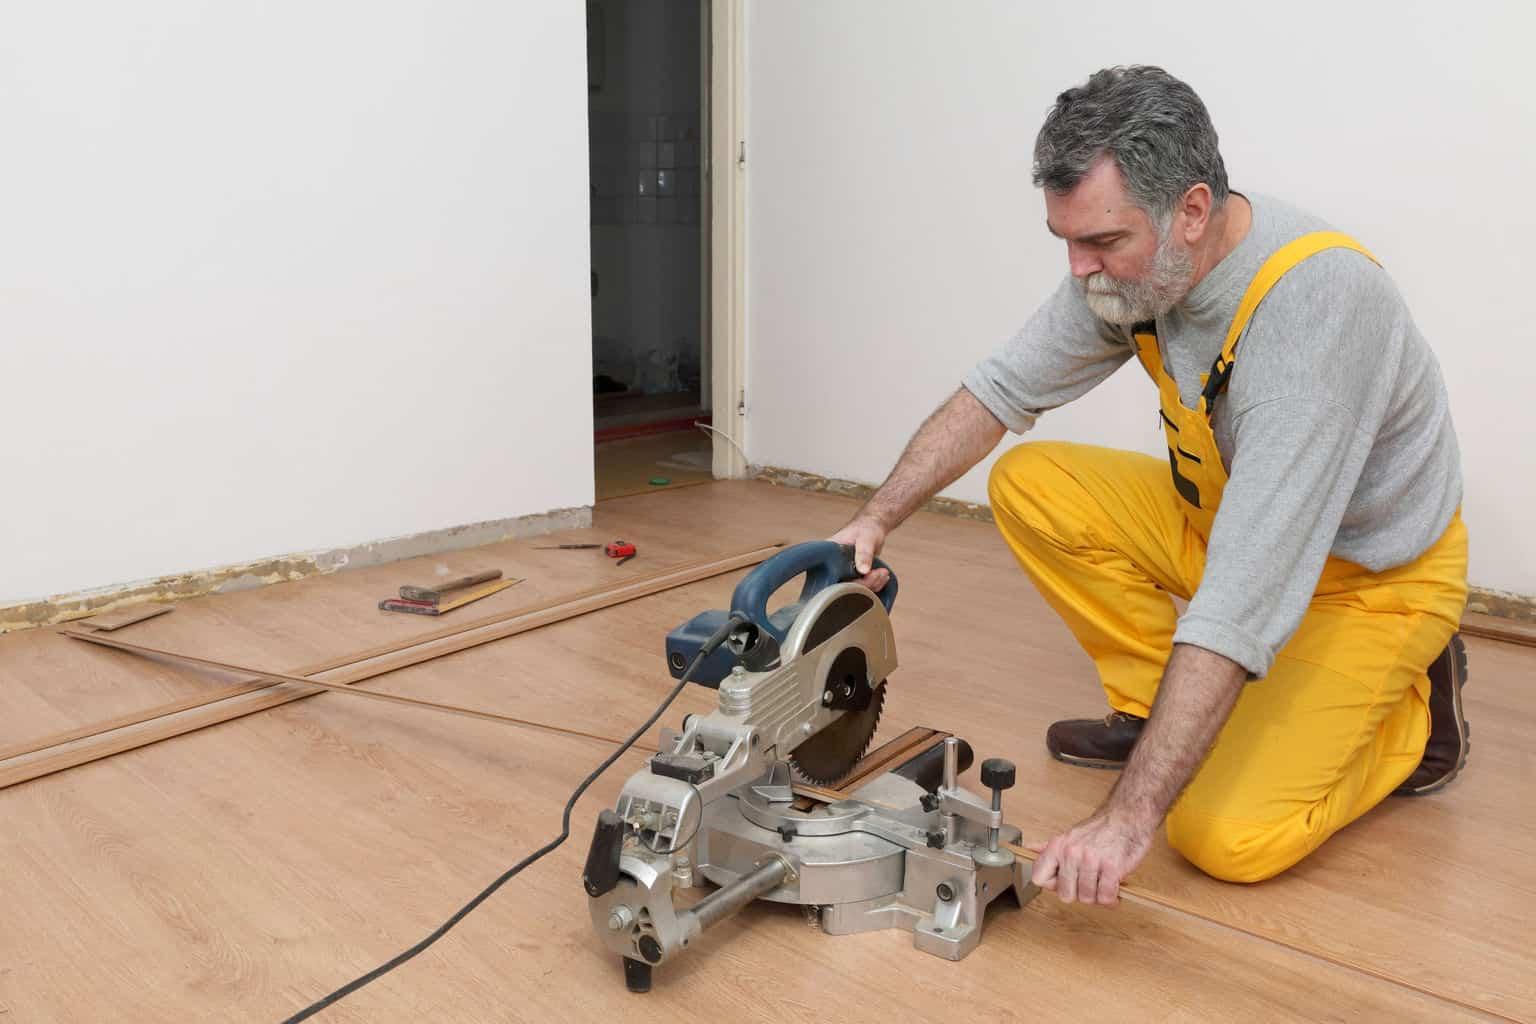 How To Vinyl Flooring Installation - 5 common mistakes when installing vinyl flooring